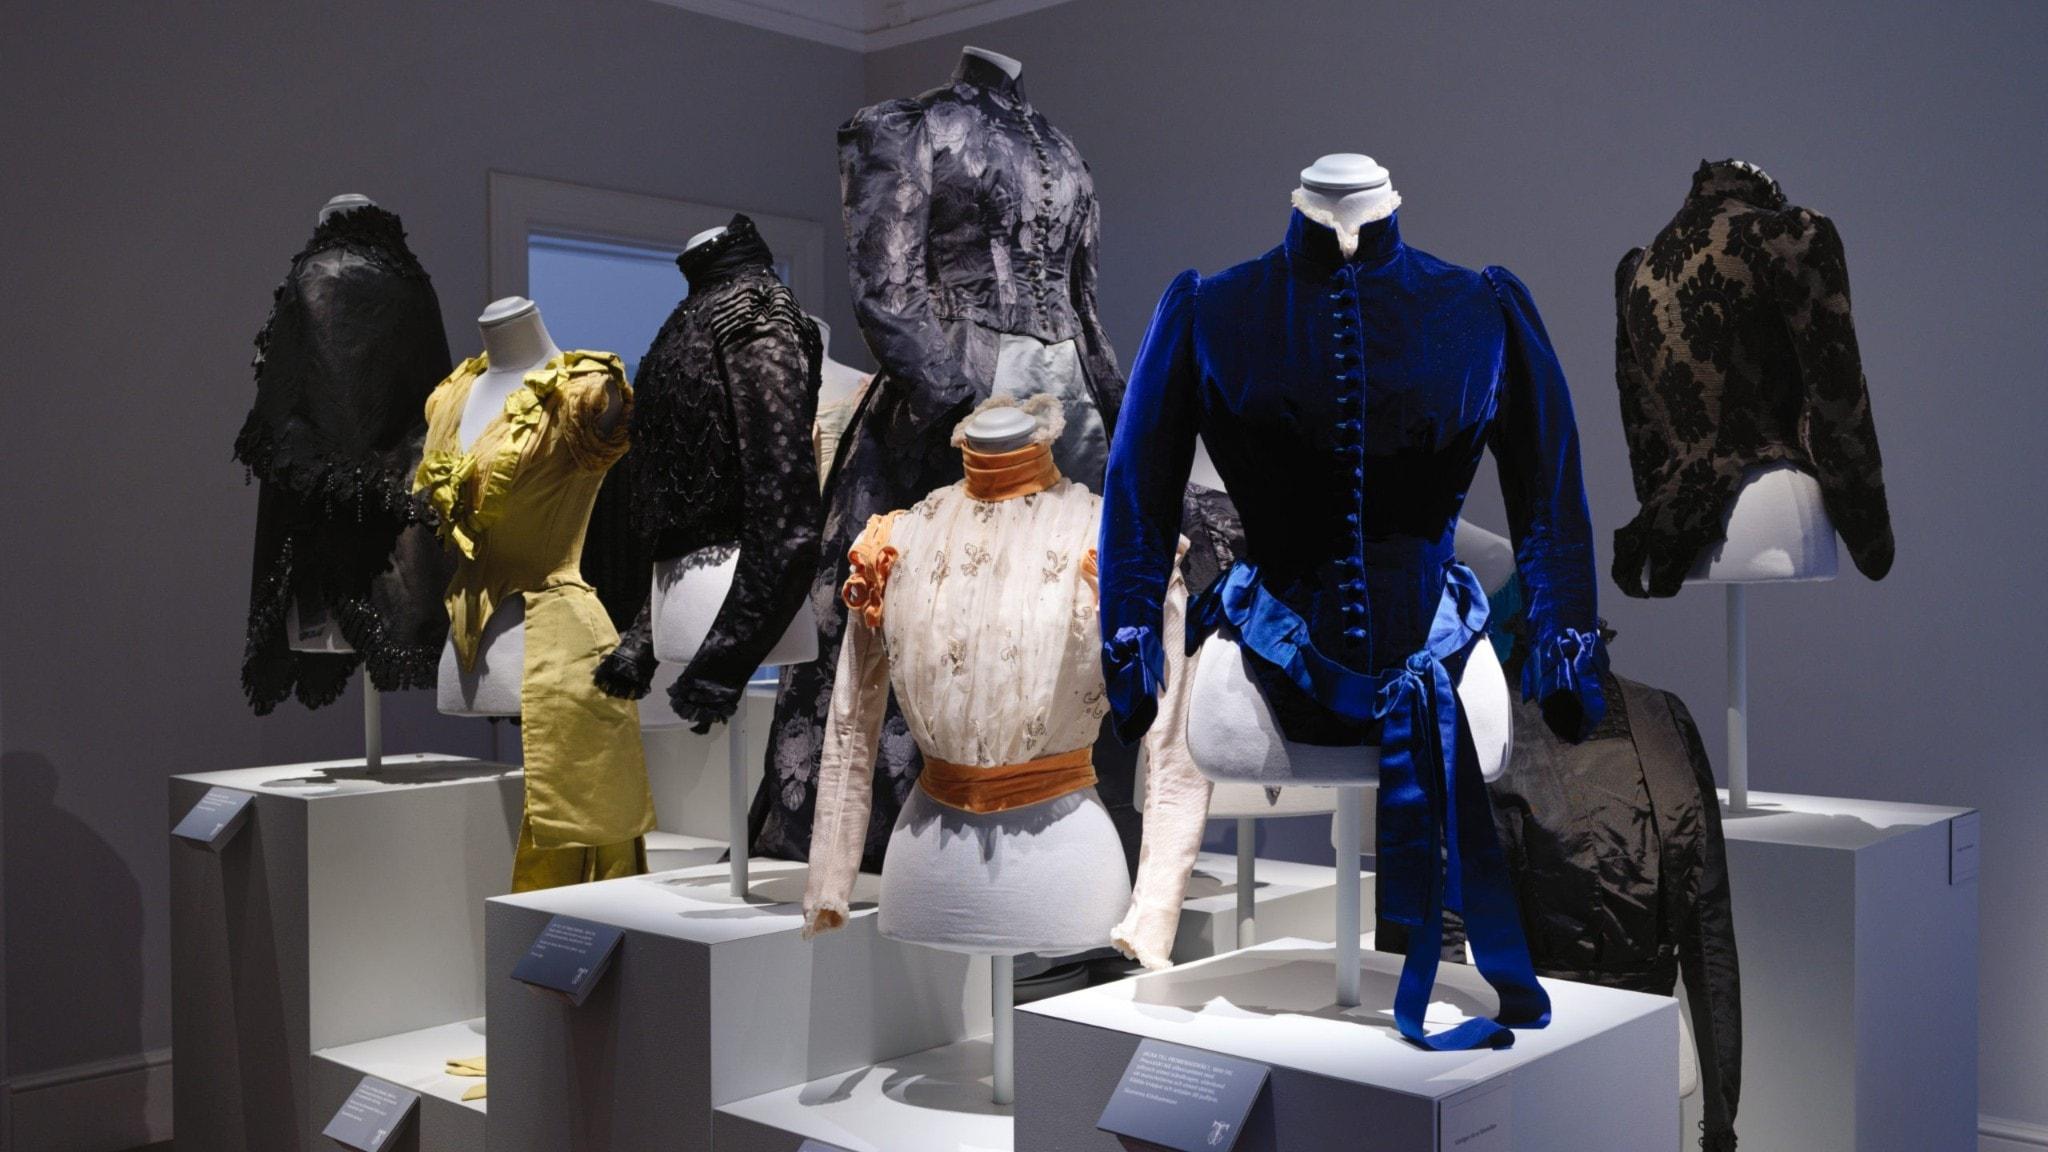 Svenskt modes urmoder i helfigur på Thielska galleriet